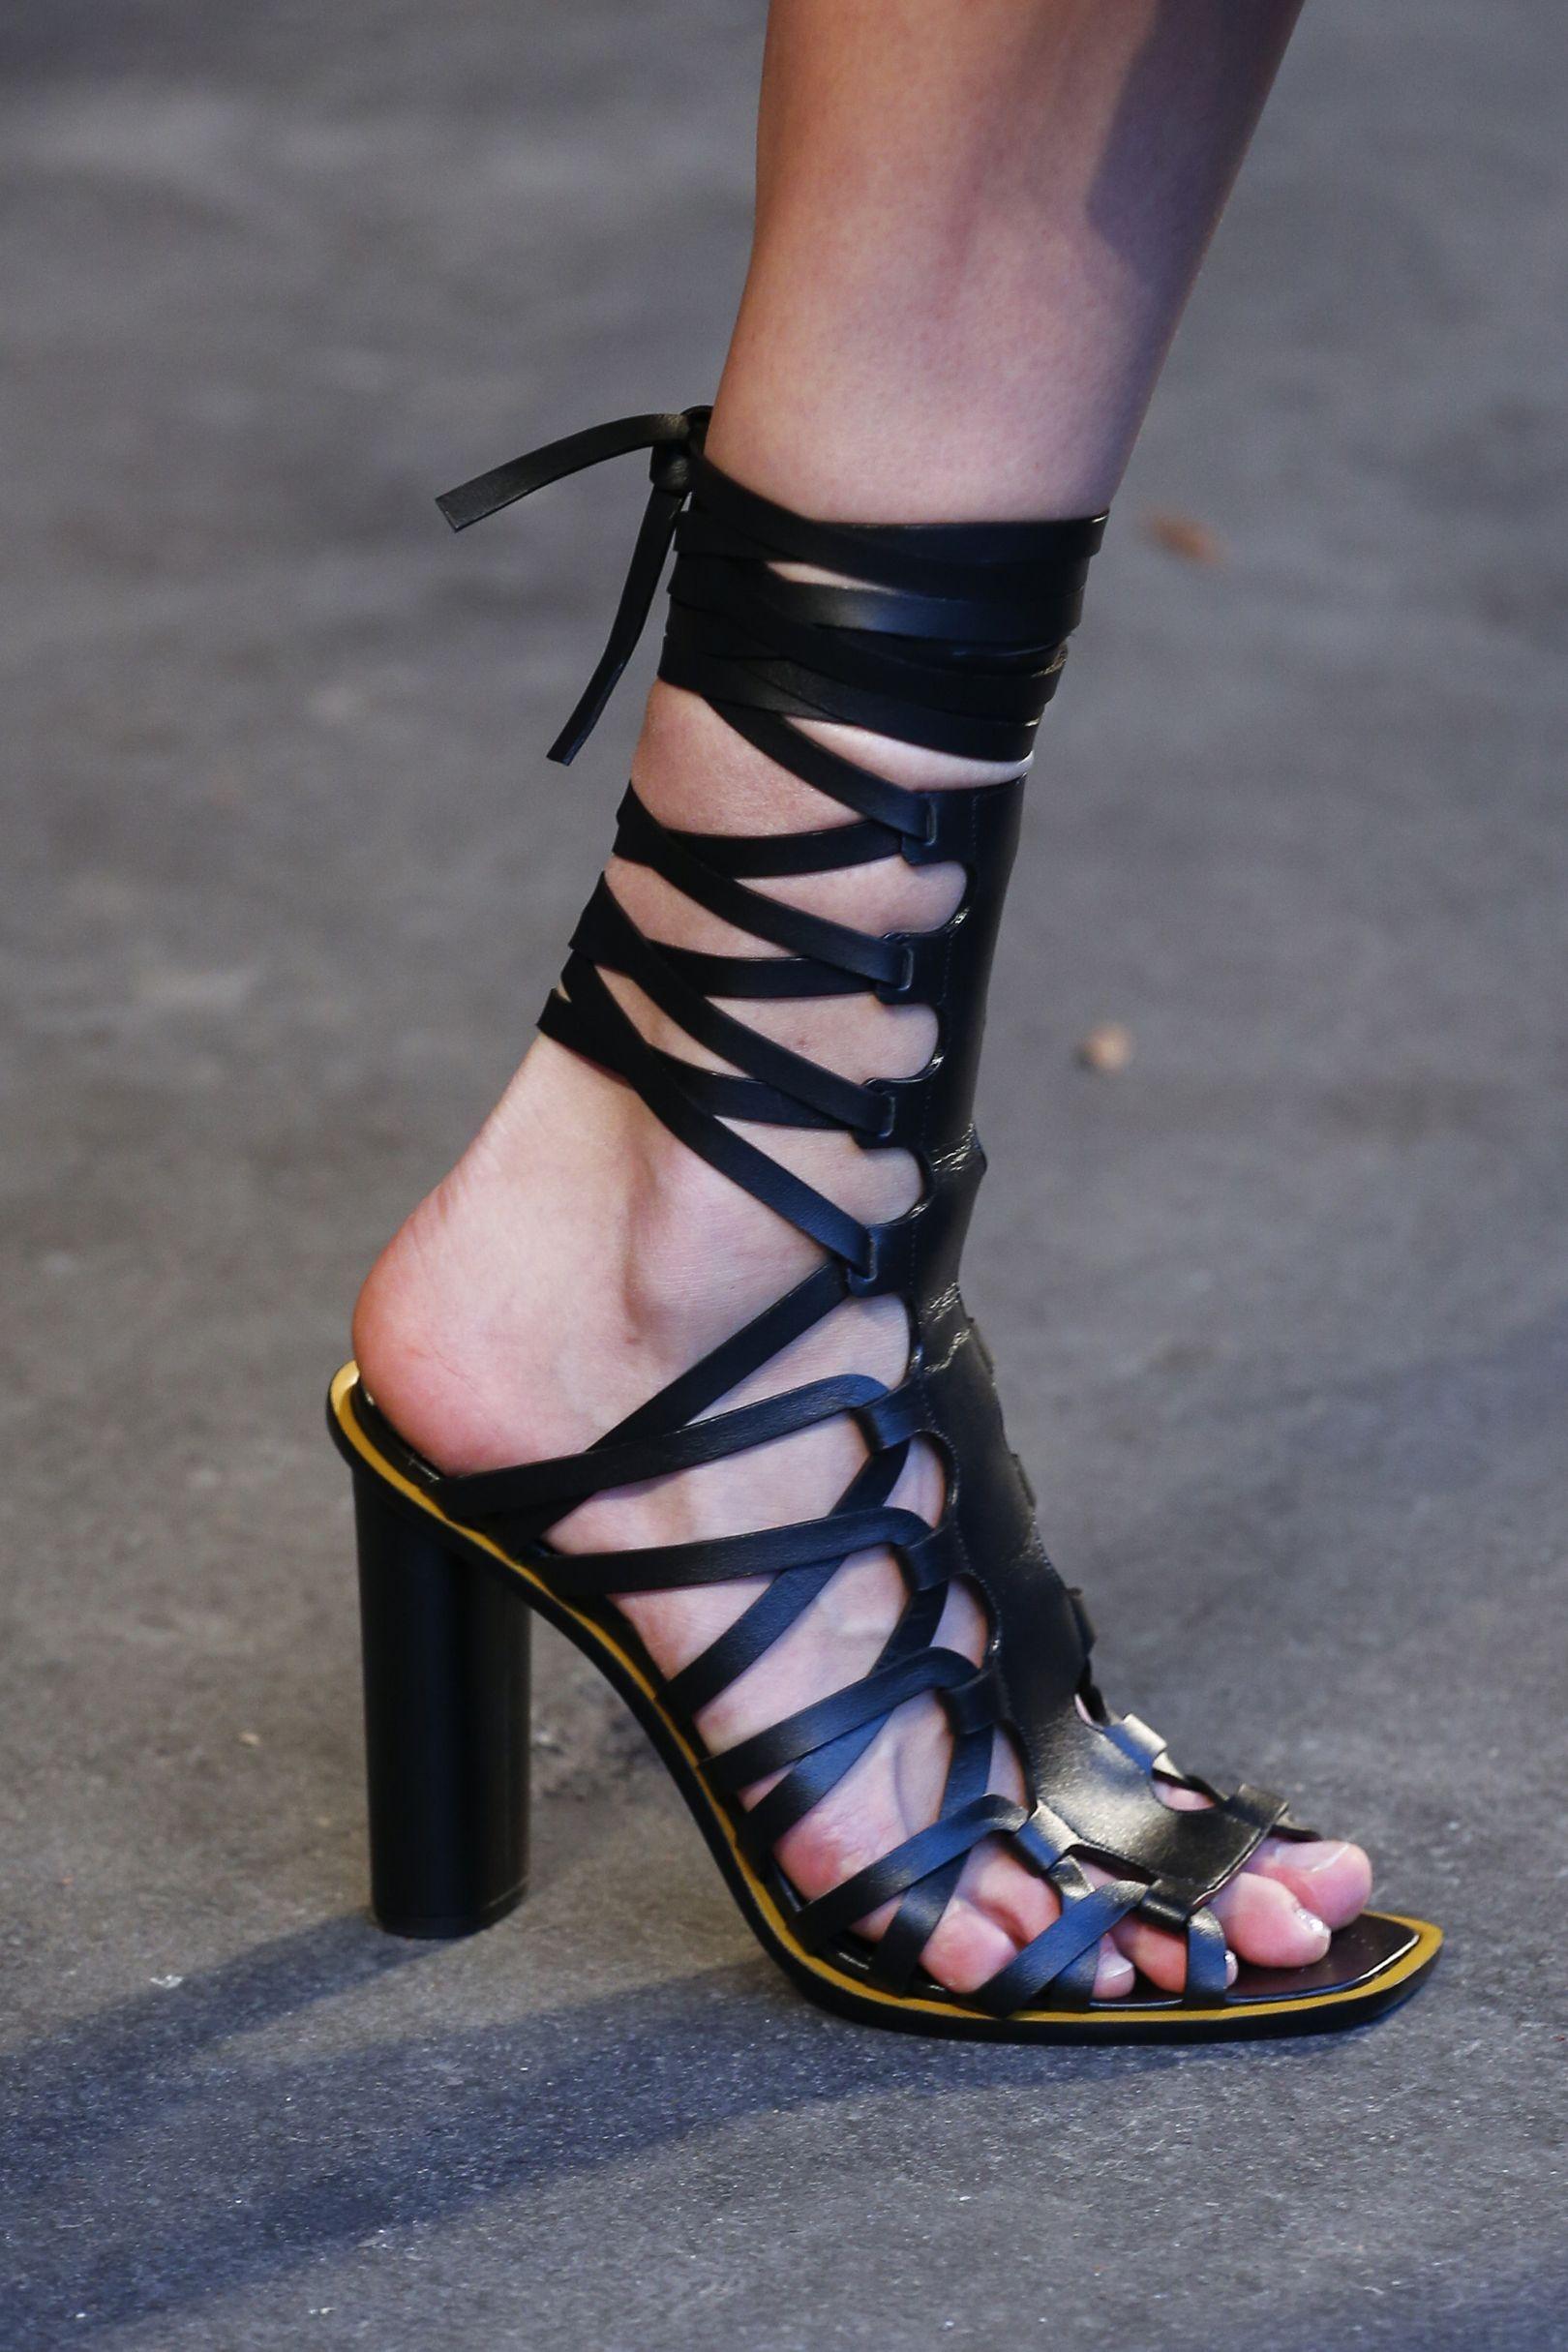 Lace Up RAINBOW STELLAR Sandals Spring/summer Dior Geniue Stockist Cheap Price pMBKe2